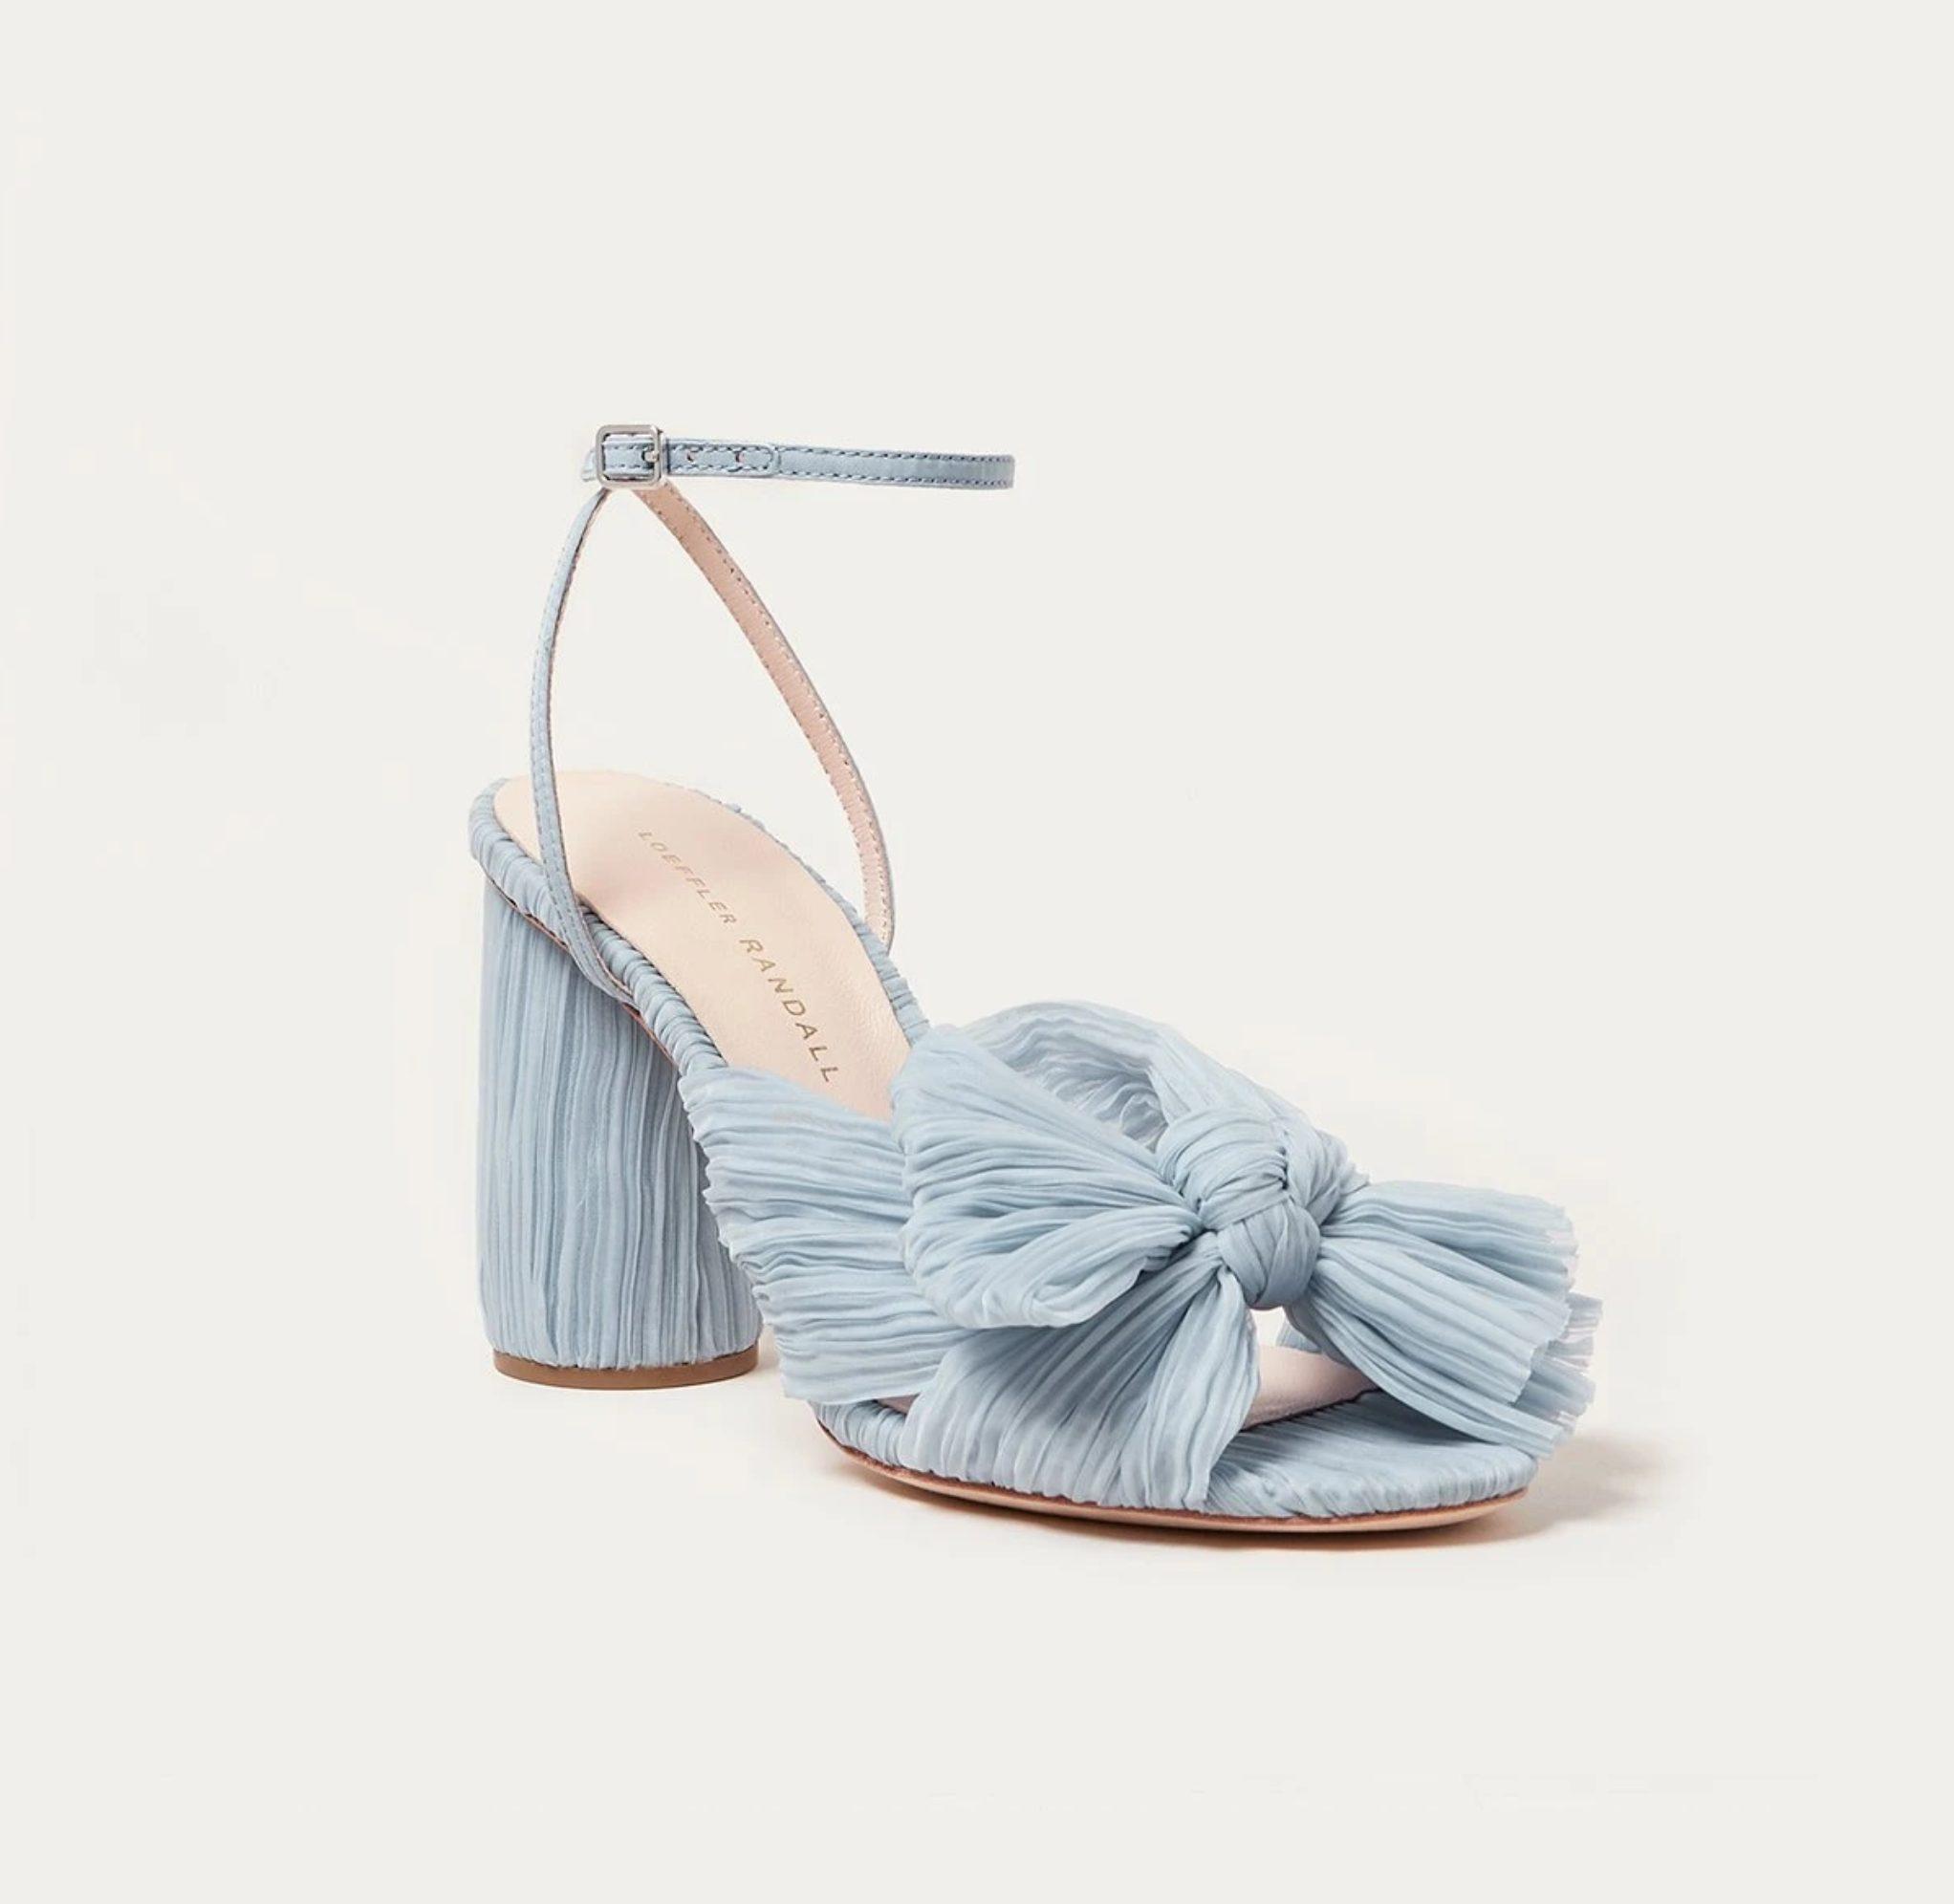 Zapatos de novia de Sophie Turner - Loeffler Randall - Wedding Hub - 09